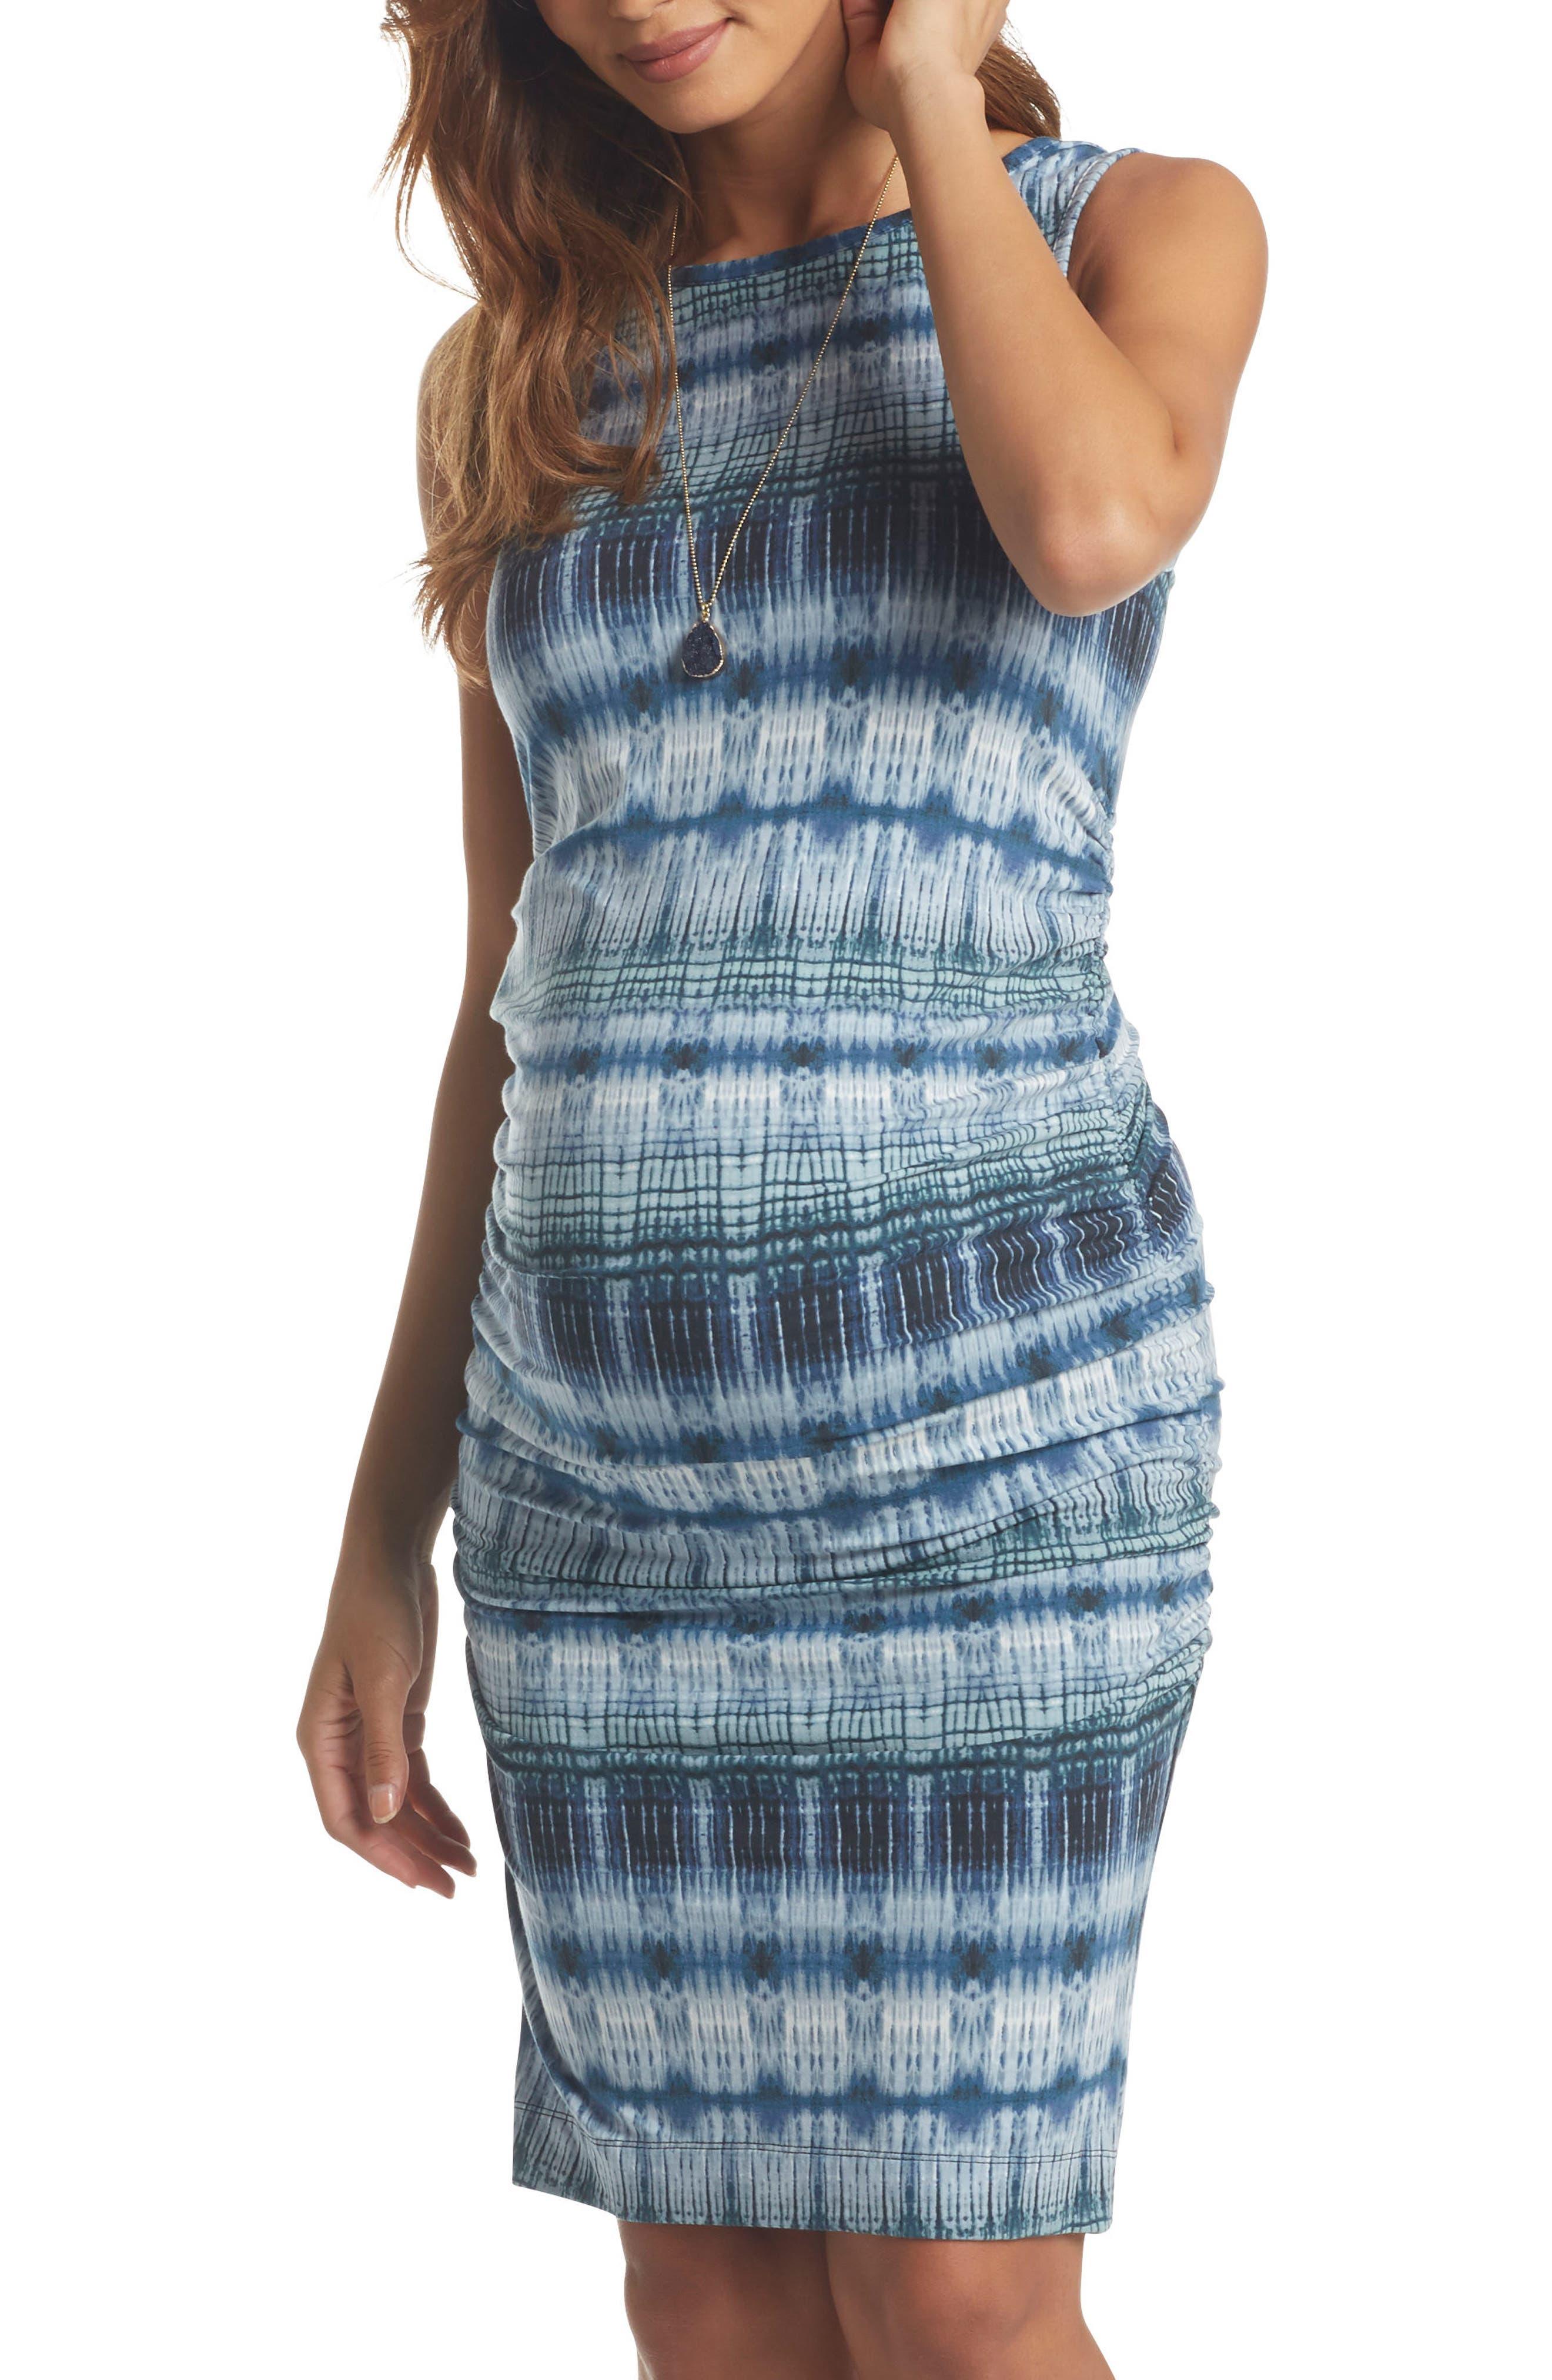 Alternate Image 1 Selected - Tart Maternity 'Presley' Tank Dress